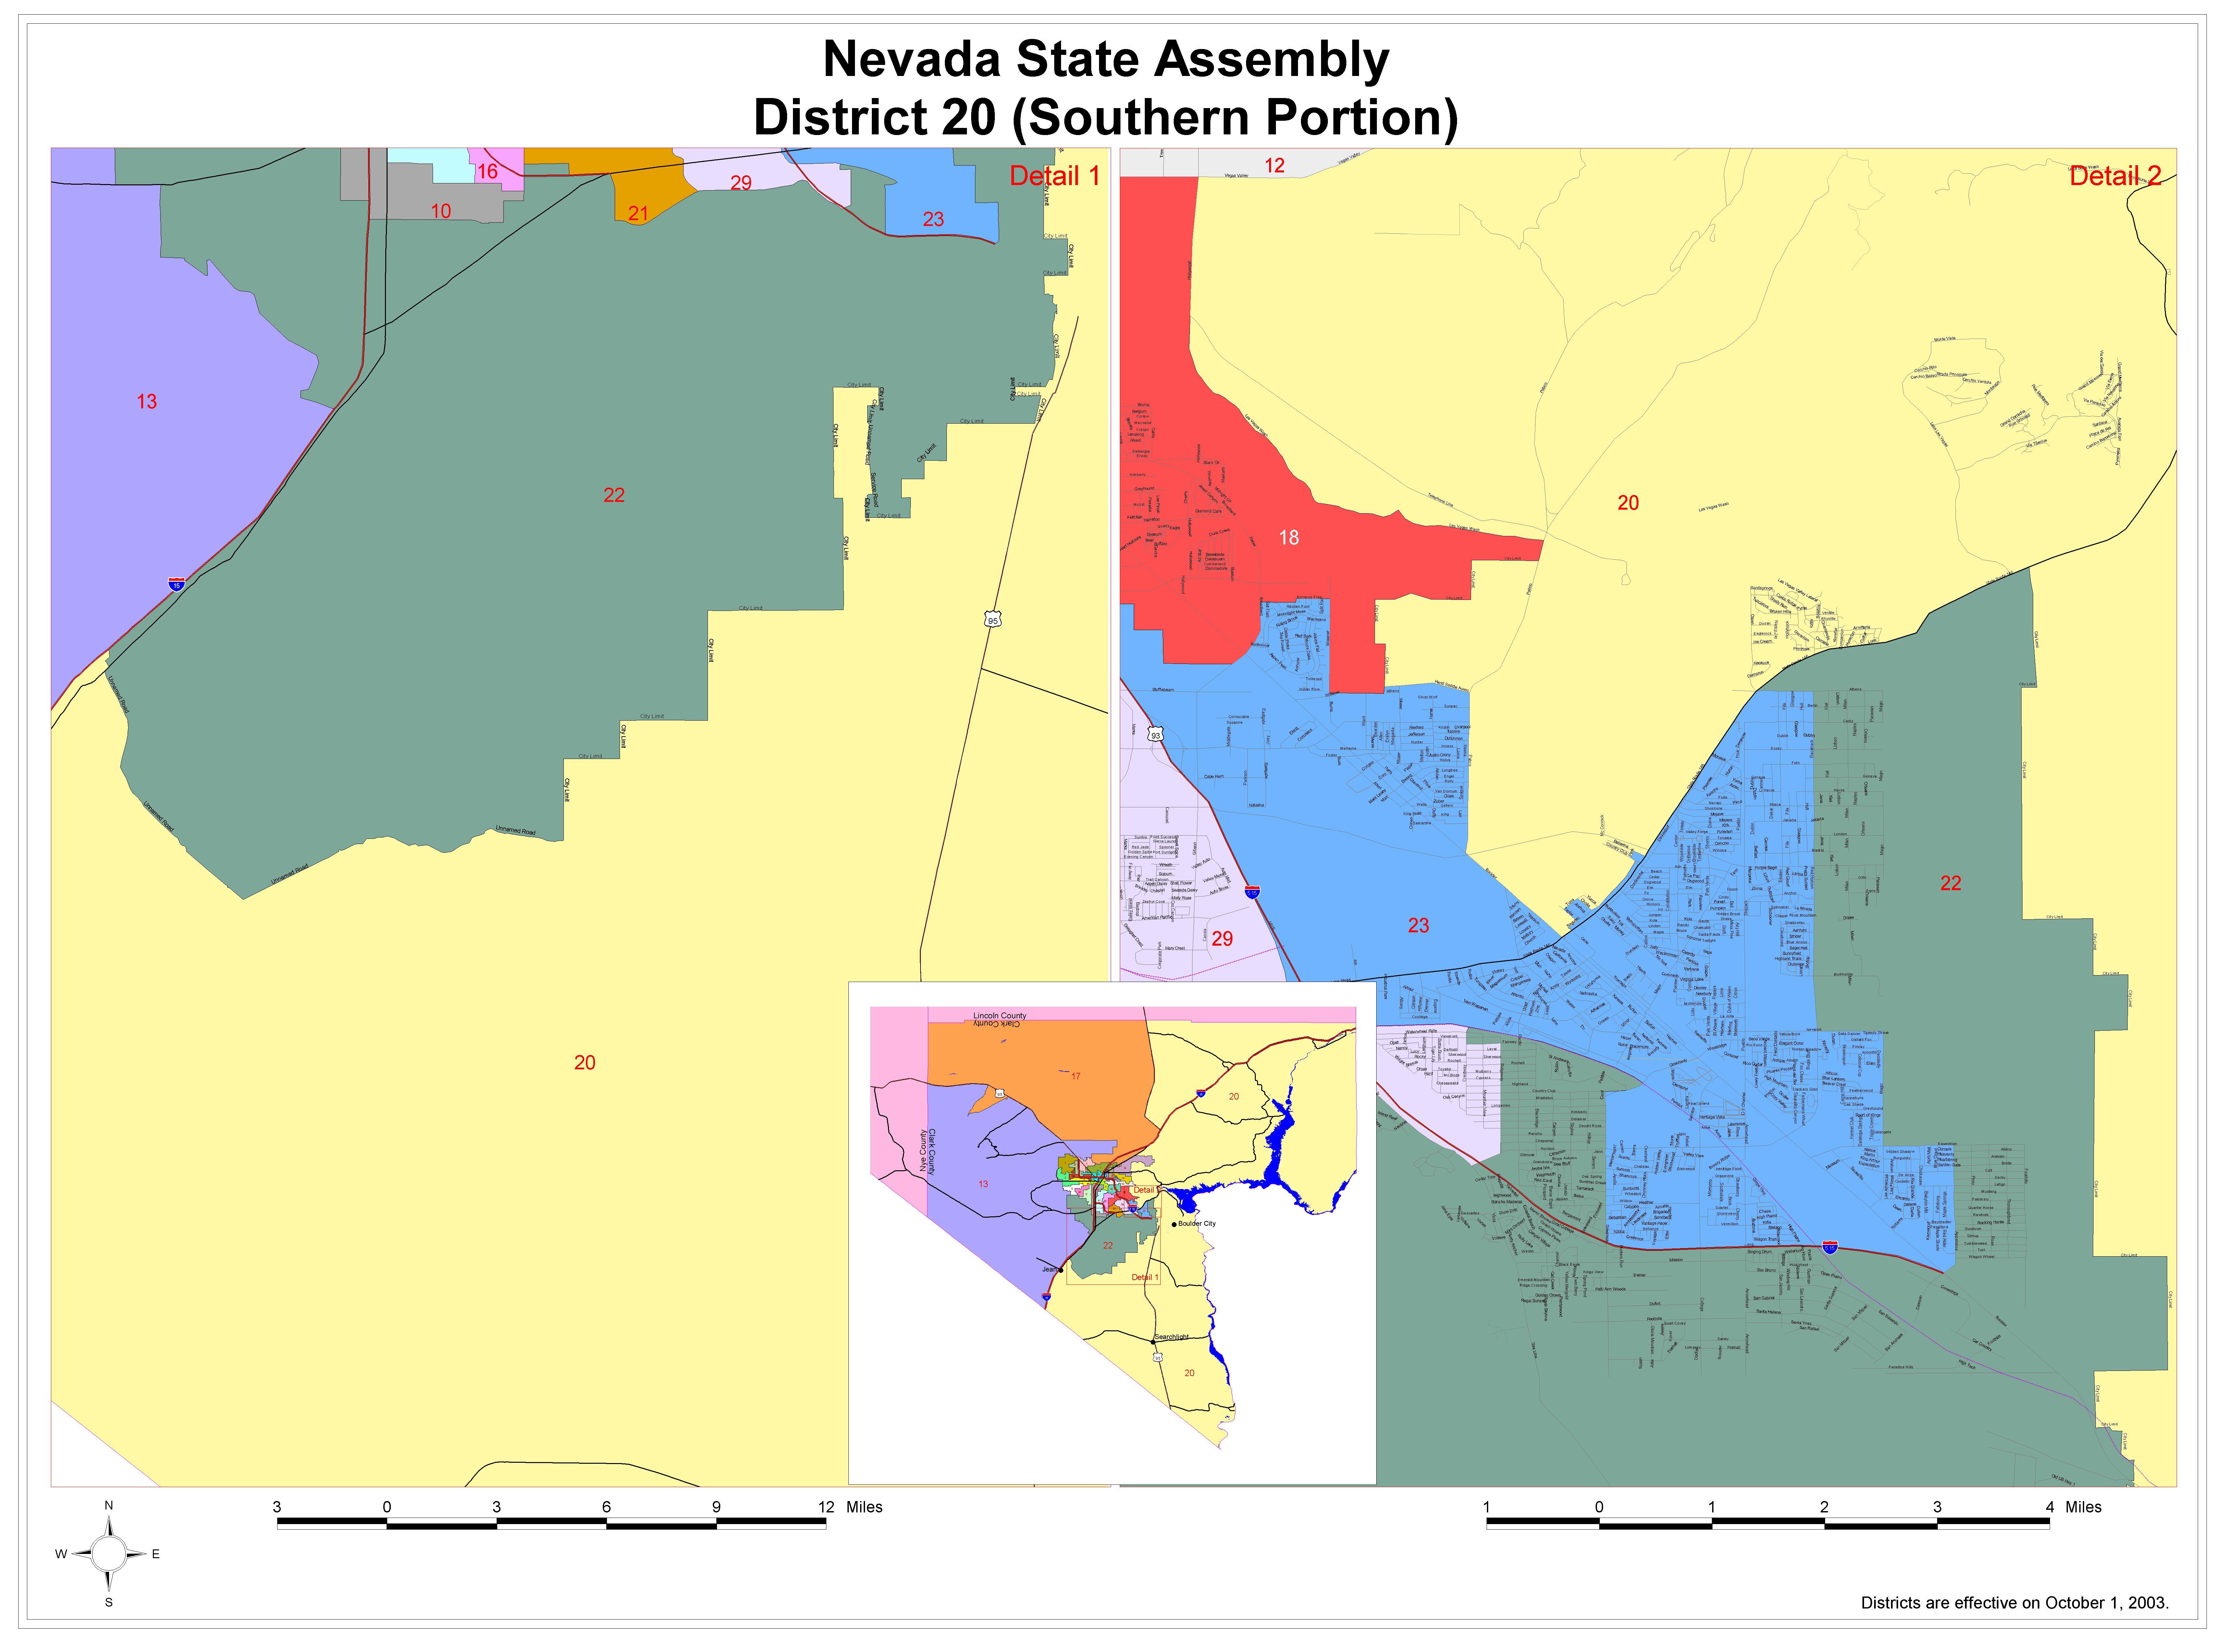 Legislative District Maps